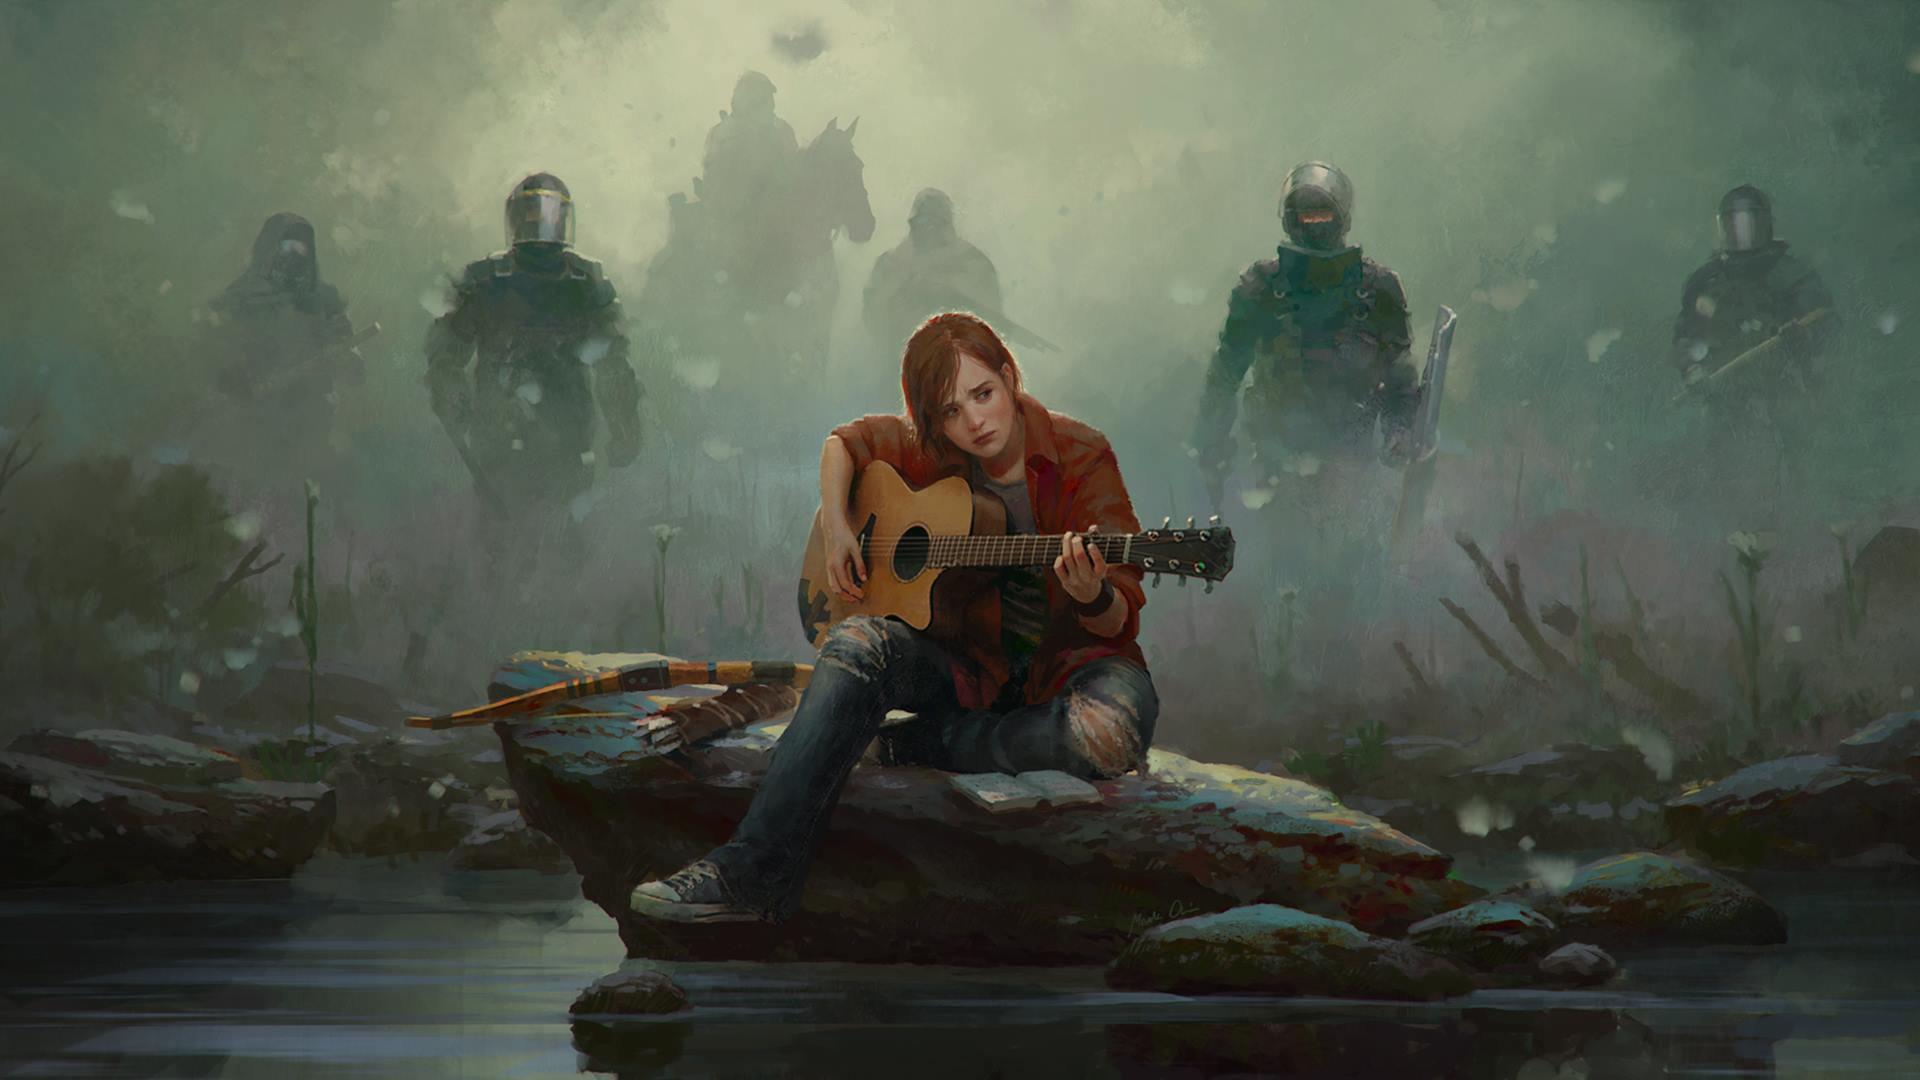 Hd Wallpaper - Last Of Us 2 Art , HD Wallpaper & Backgrounds